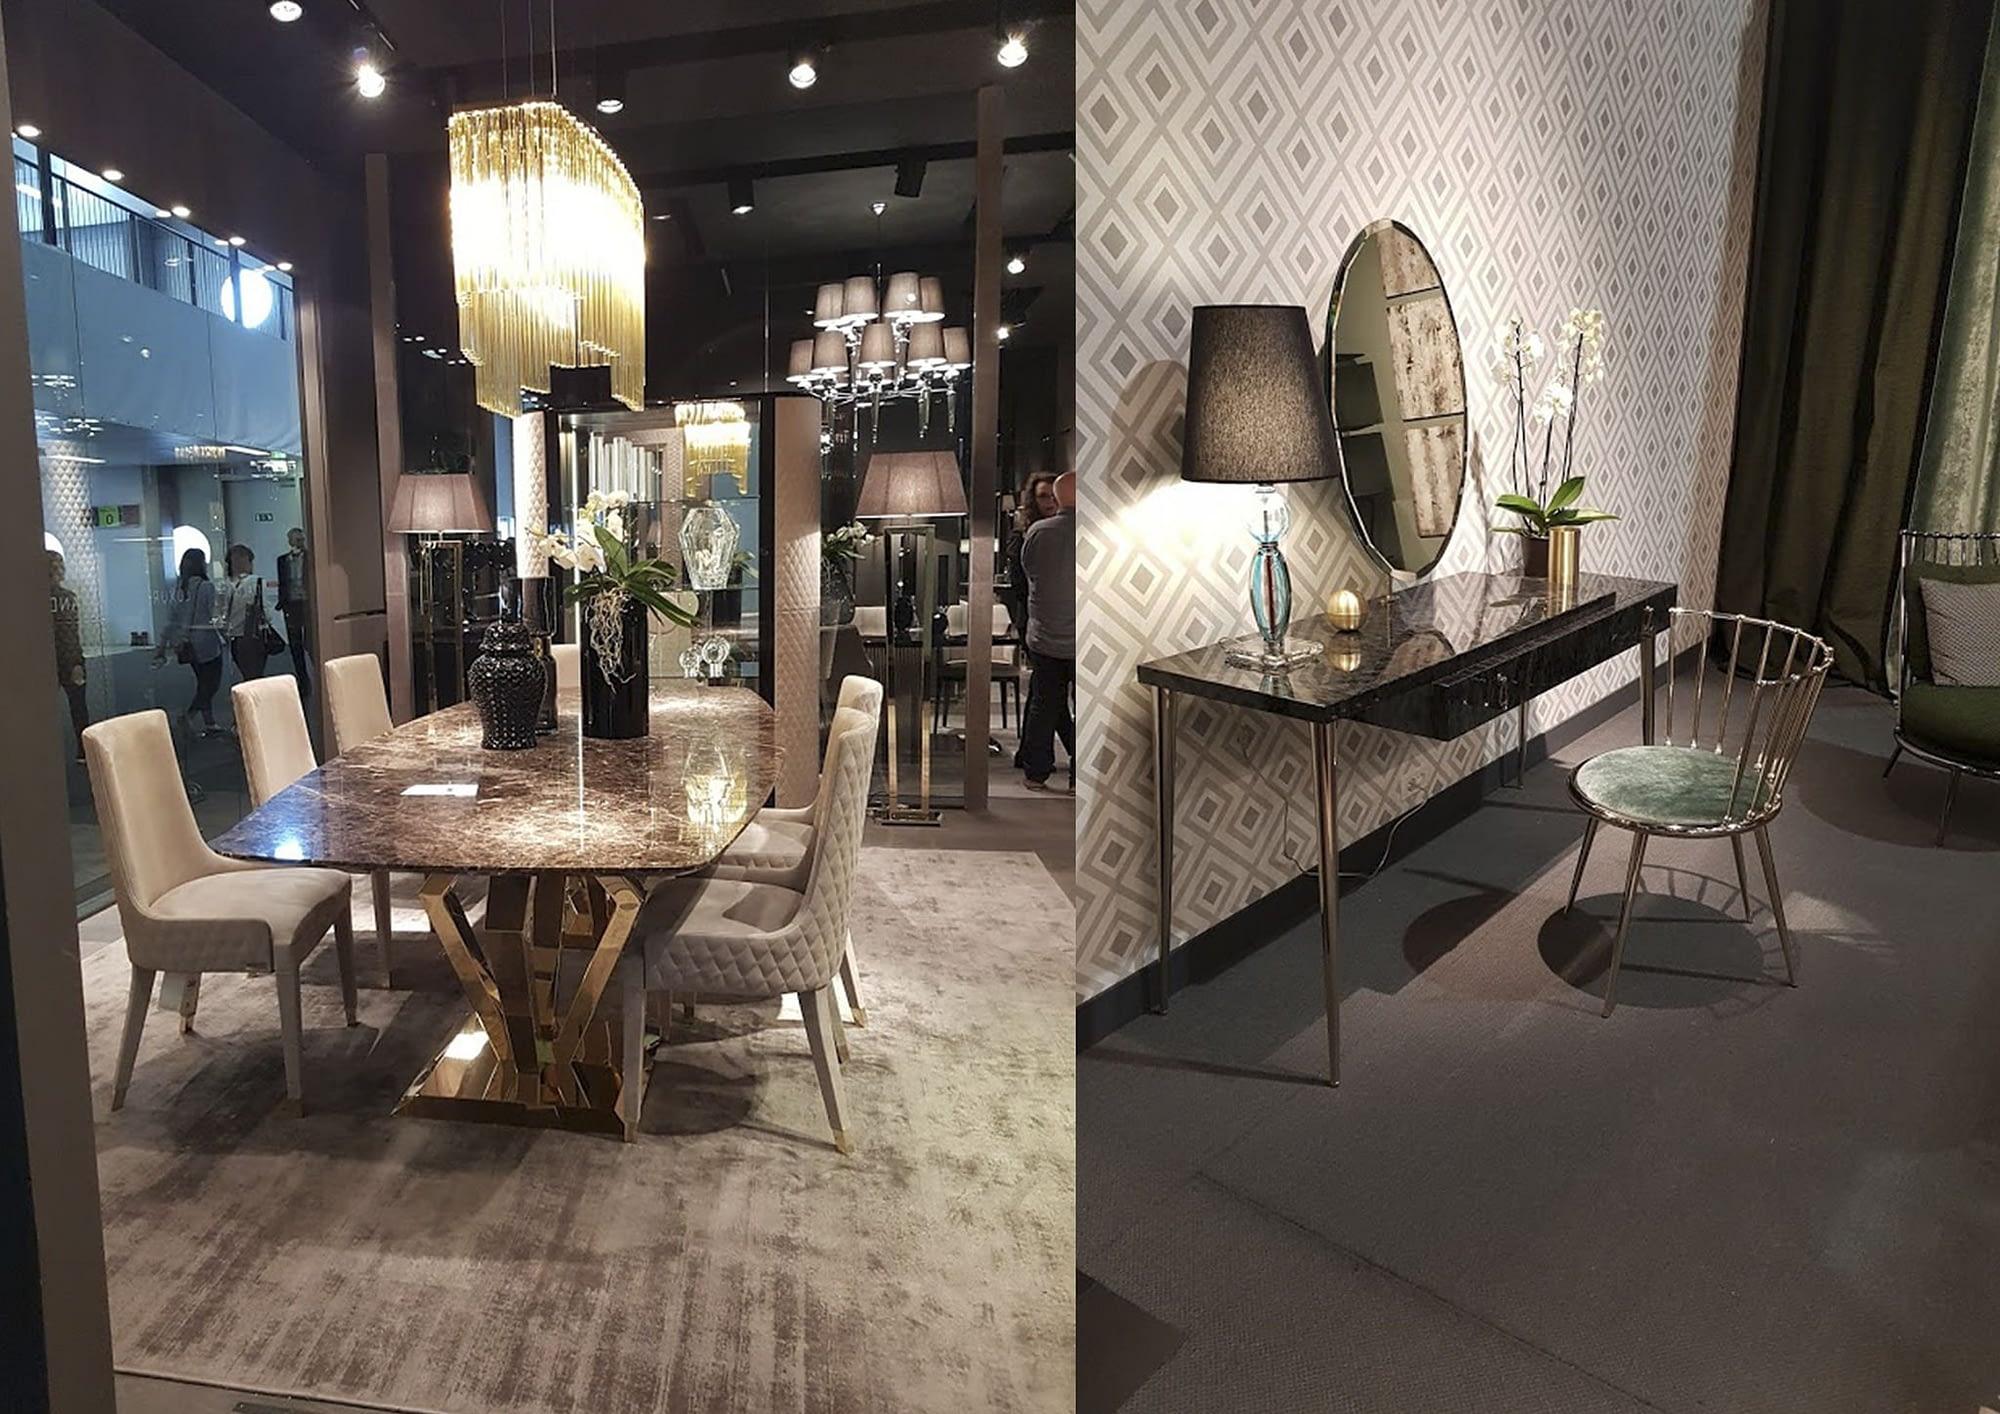 Milano Design Week 2018 - Salone del Mobile 80